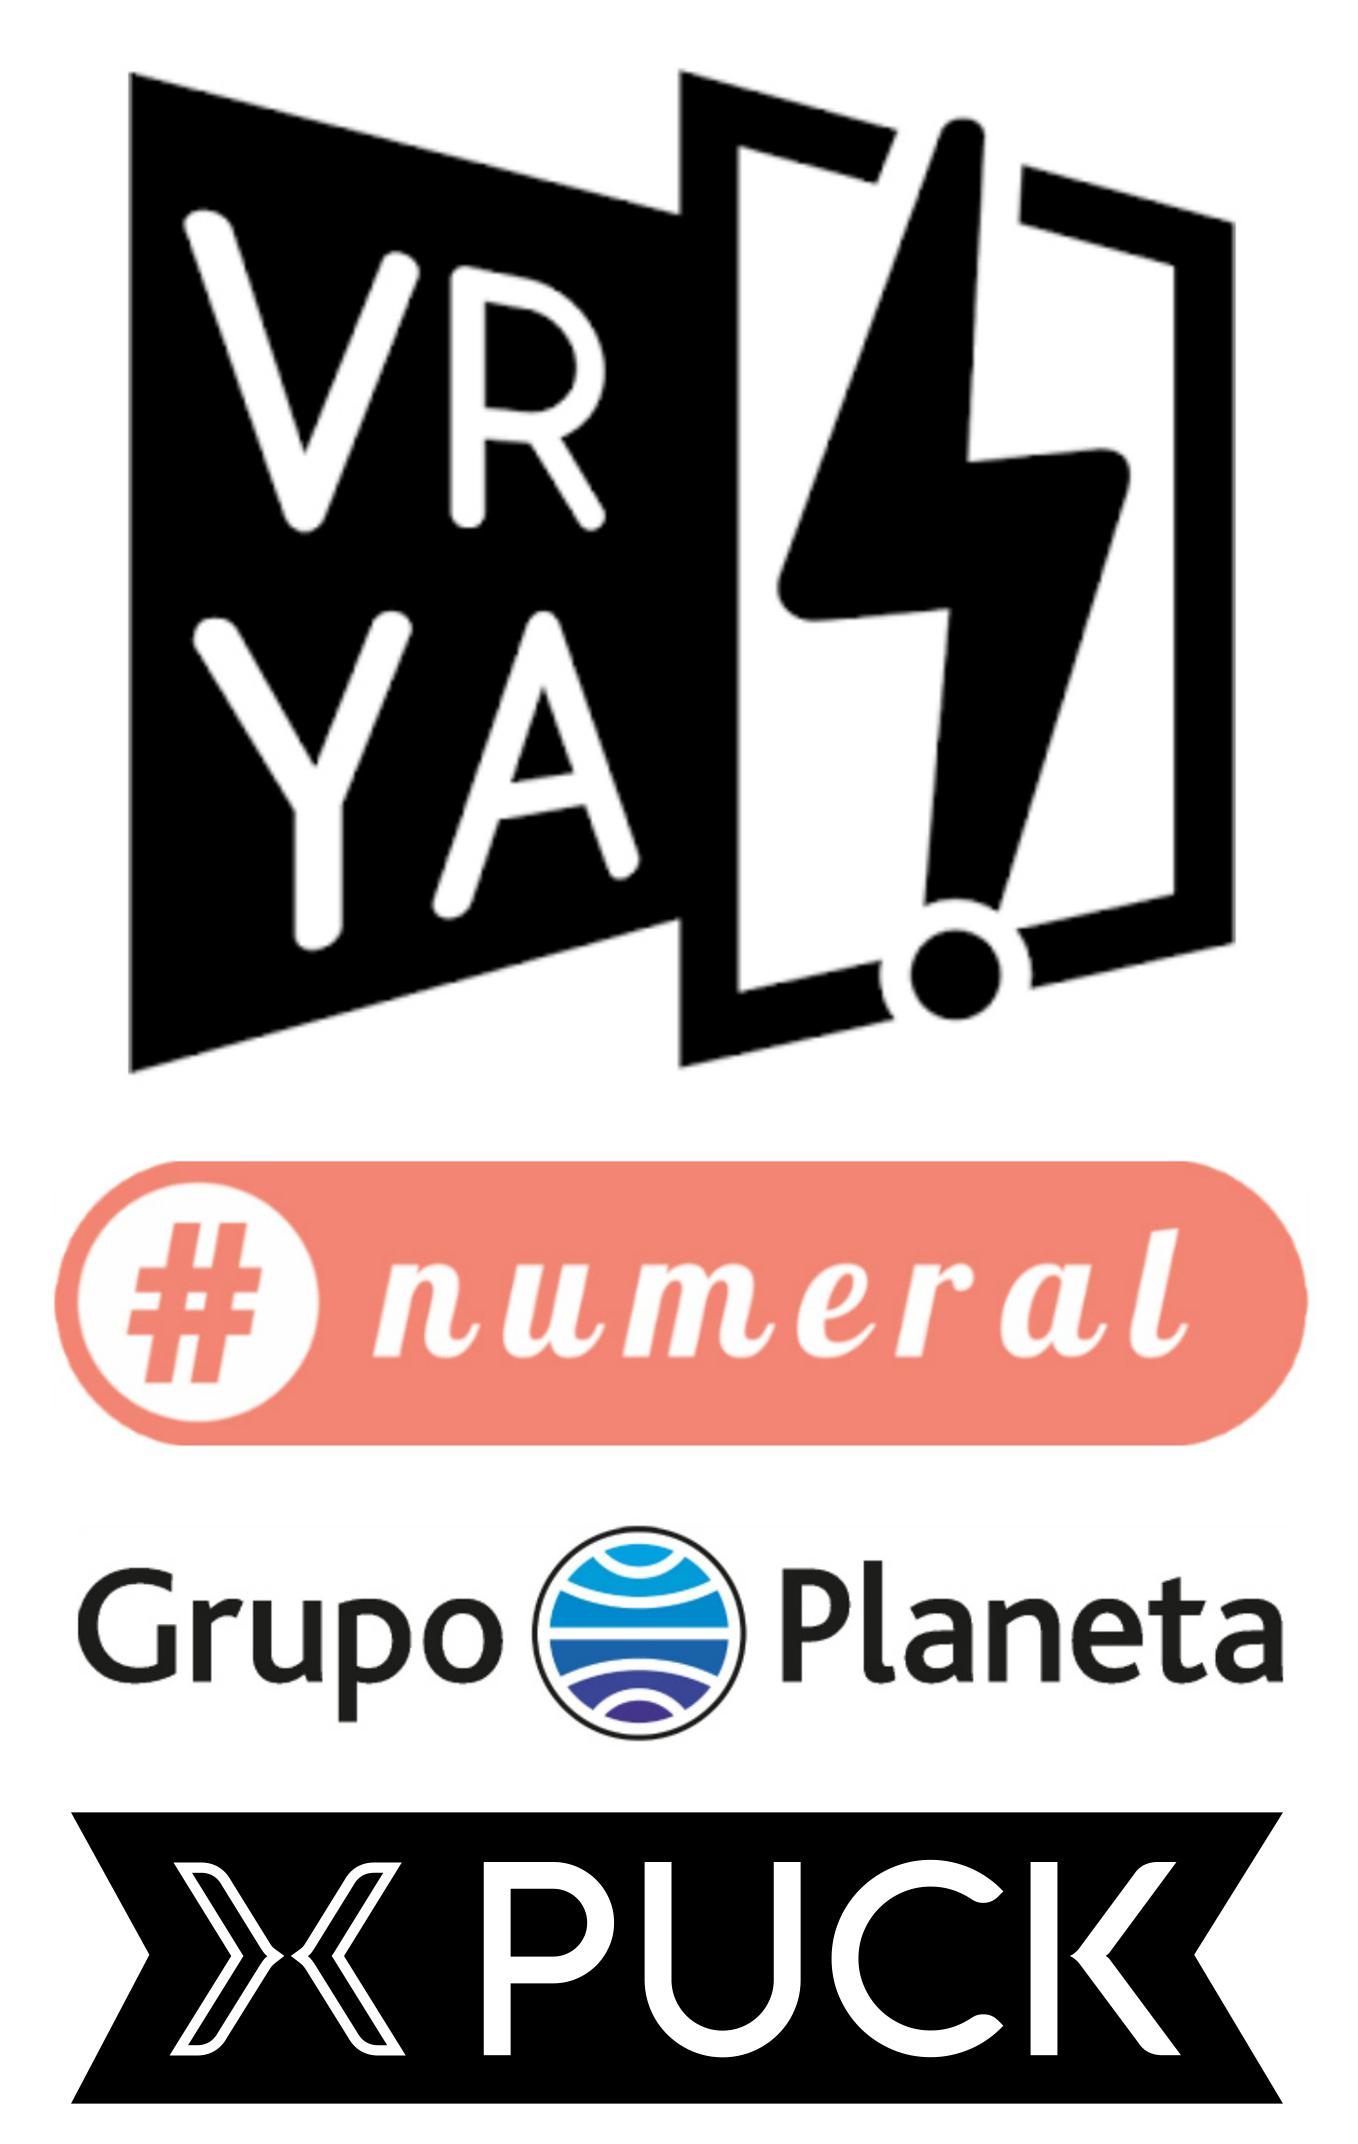 Gracias VRYA, #numeral, Planeta, Puck y PRH